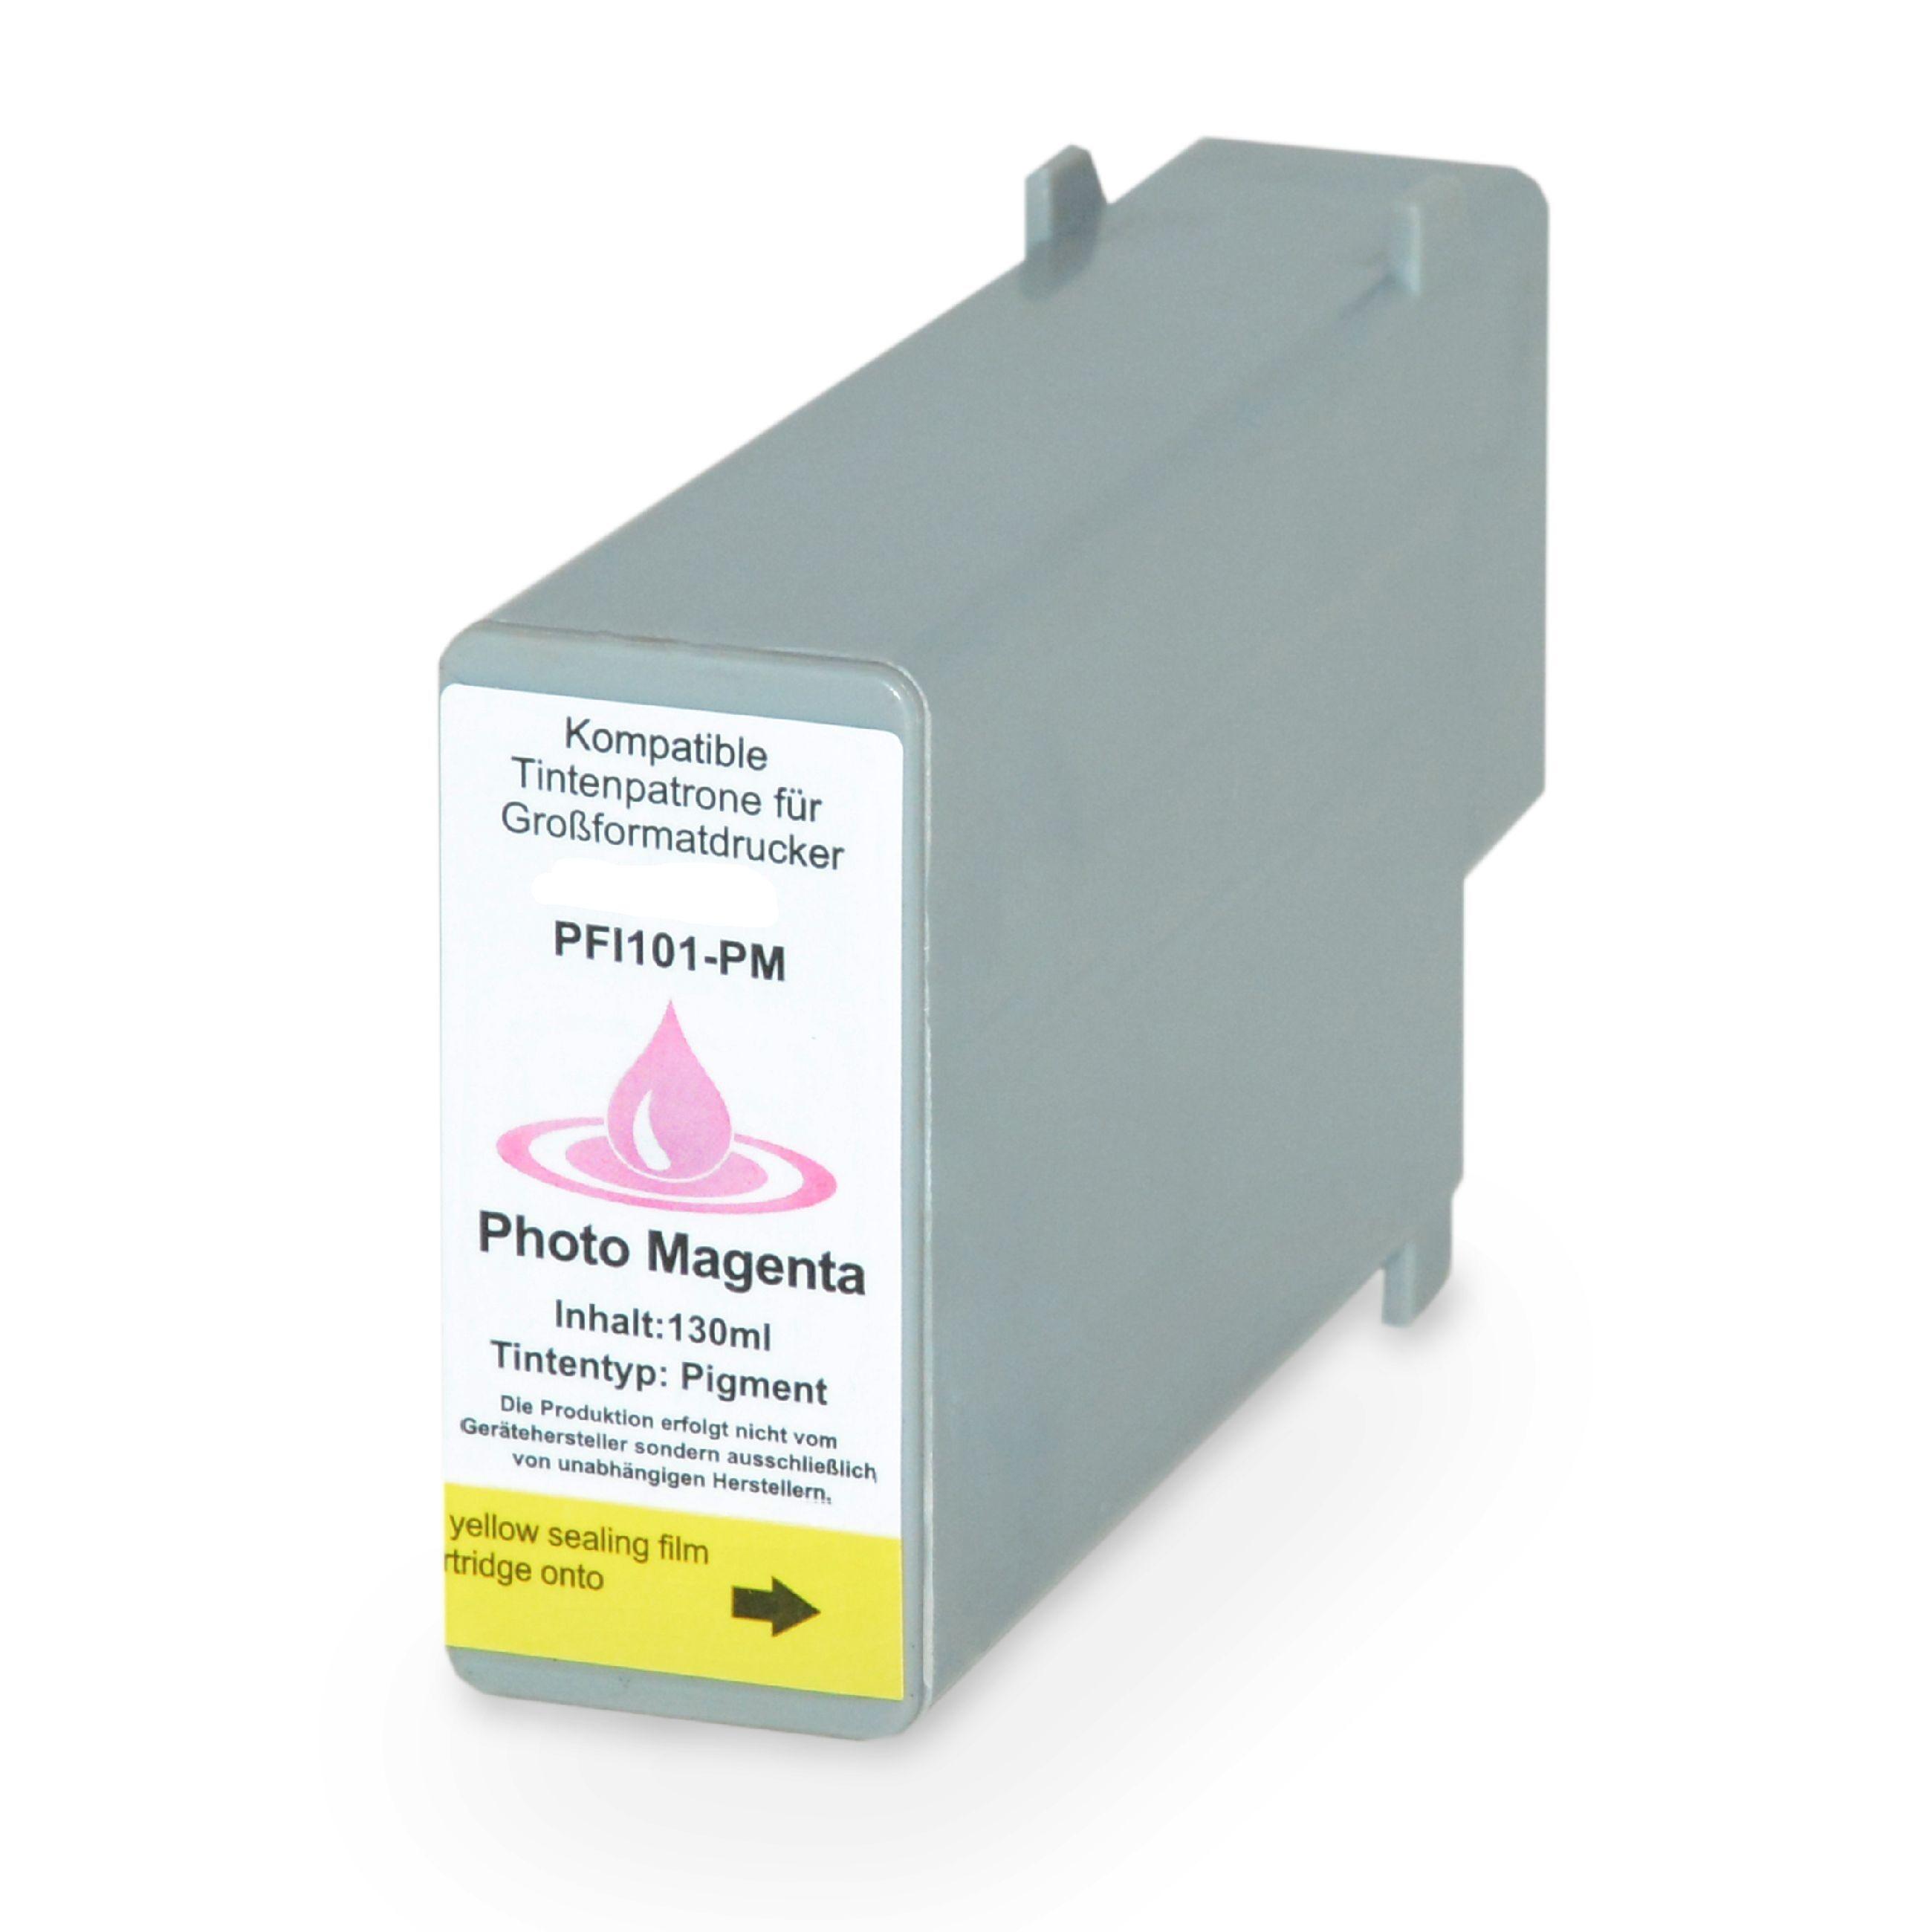 Canon Cartouche d'encre pour Canon 0888B001 / PFI-101 PM Magenta-photo compatible (de marque ASC)